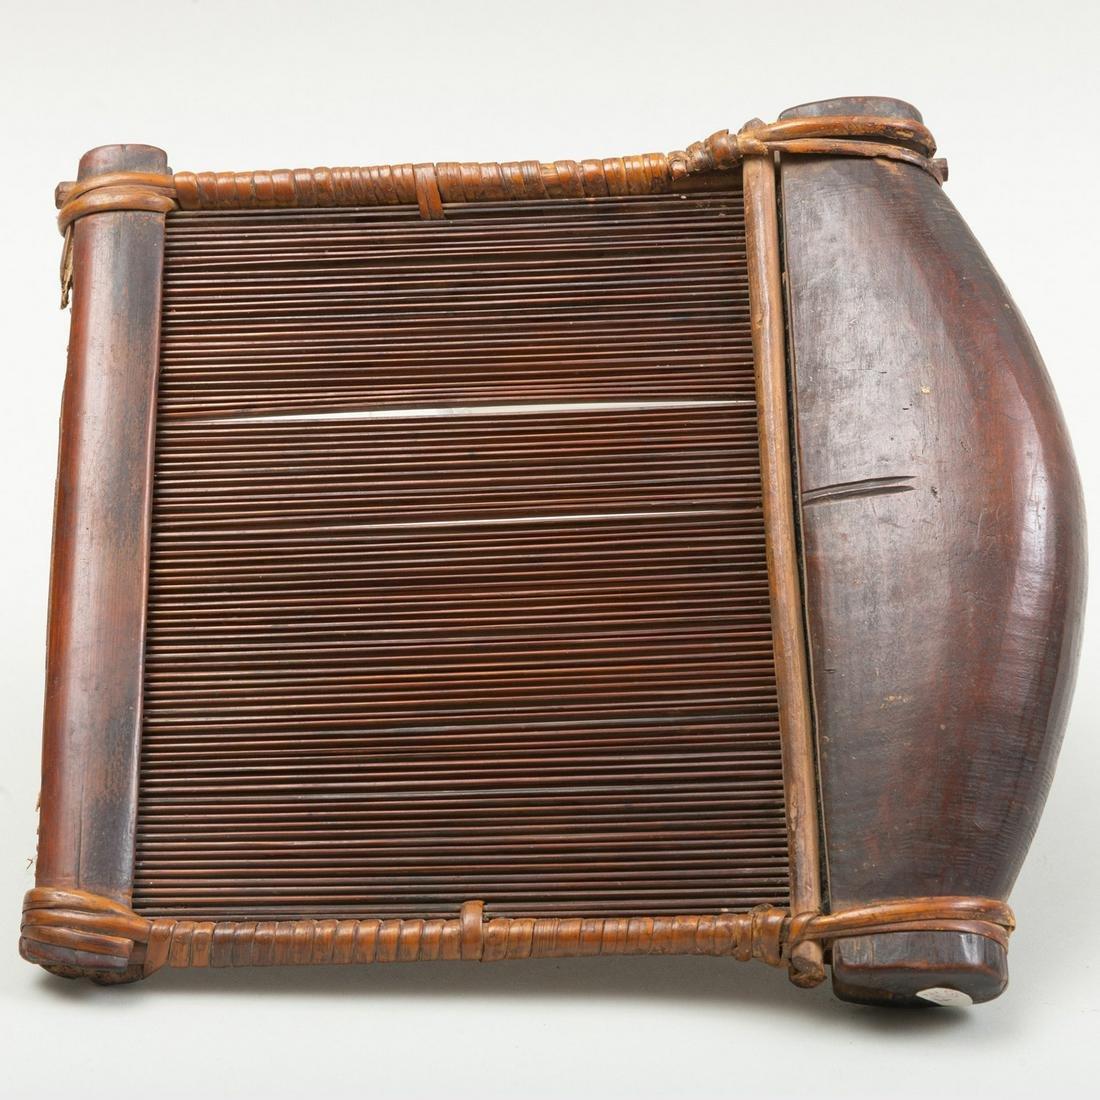 West African Wooden Slip Loom, Possibly Baule or